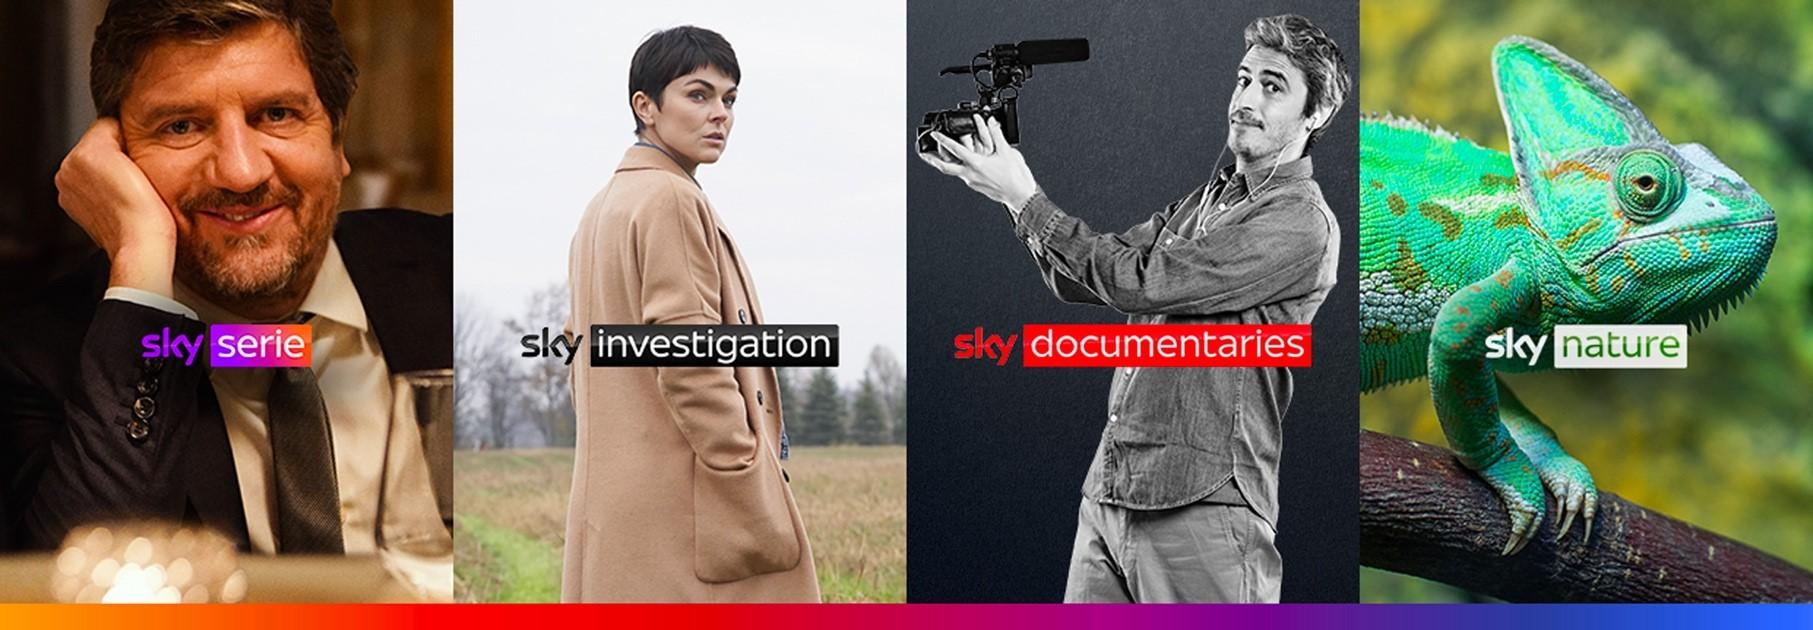 4 nuovi canali: dal 1 luglio Sky Serie, Sky Investigation, Sky Documentaries e Sky Nature